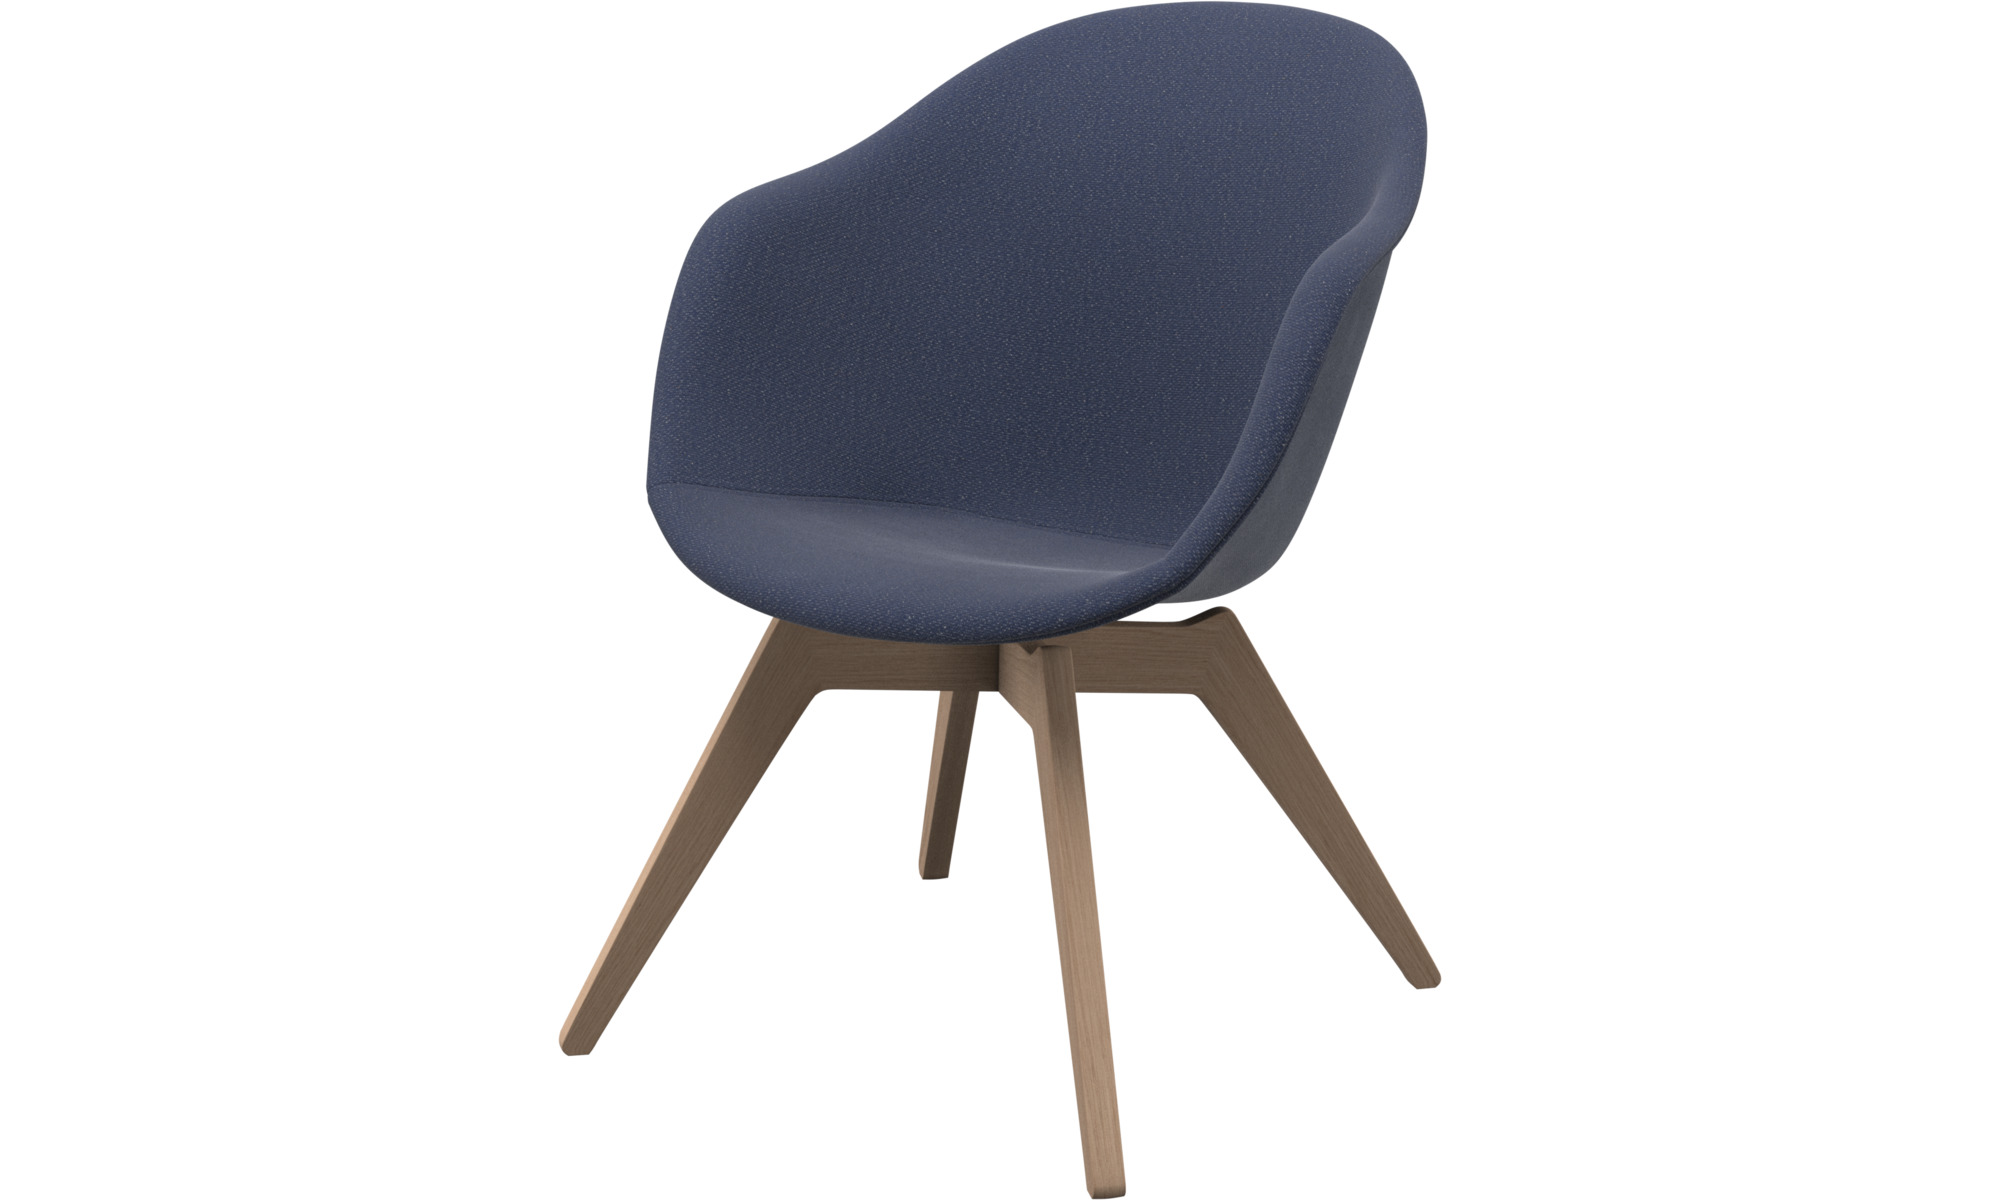 fauteuils chaise adelaide lounge boconcept. Black Bedroom Furniture Sets. Home Design Ideas